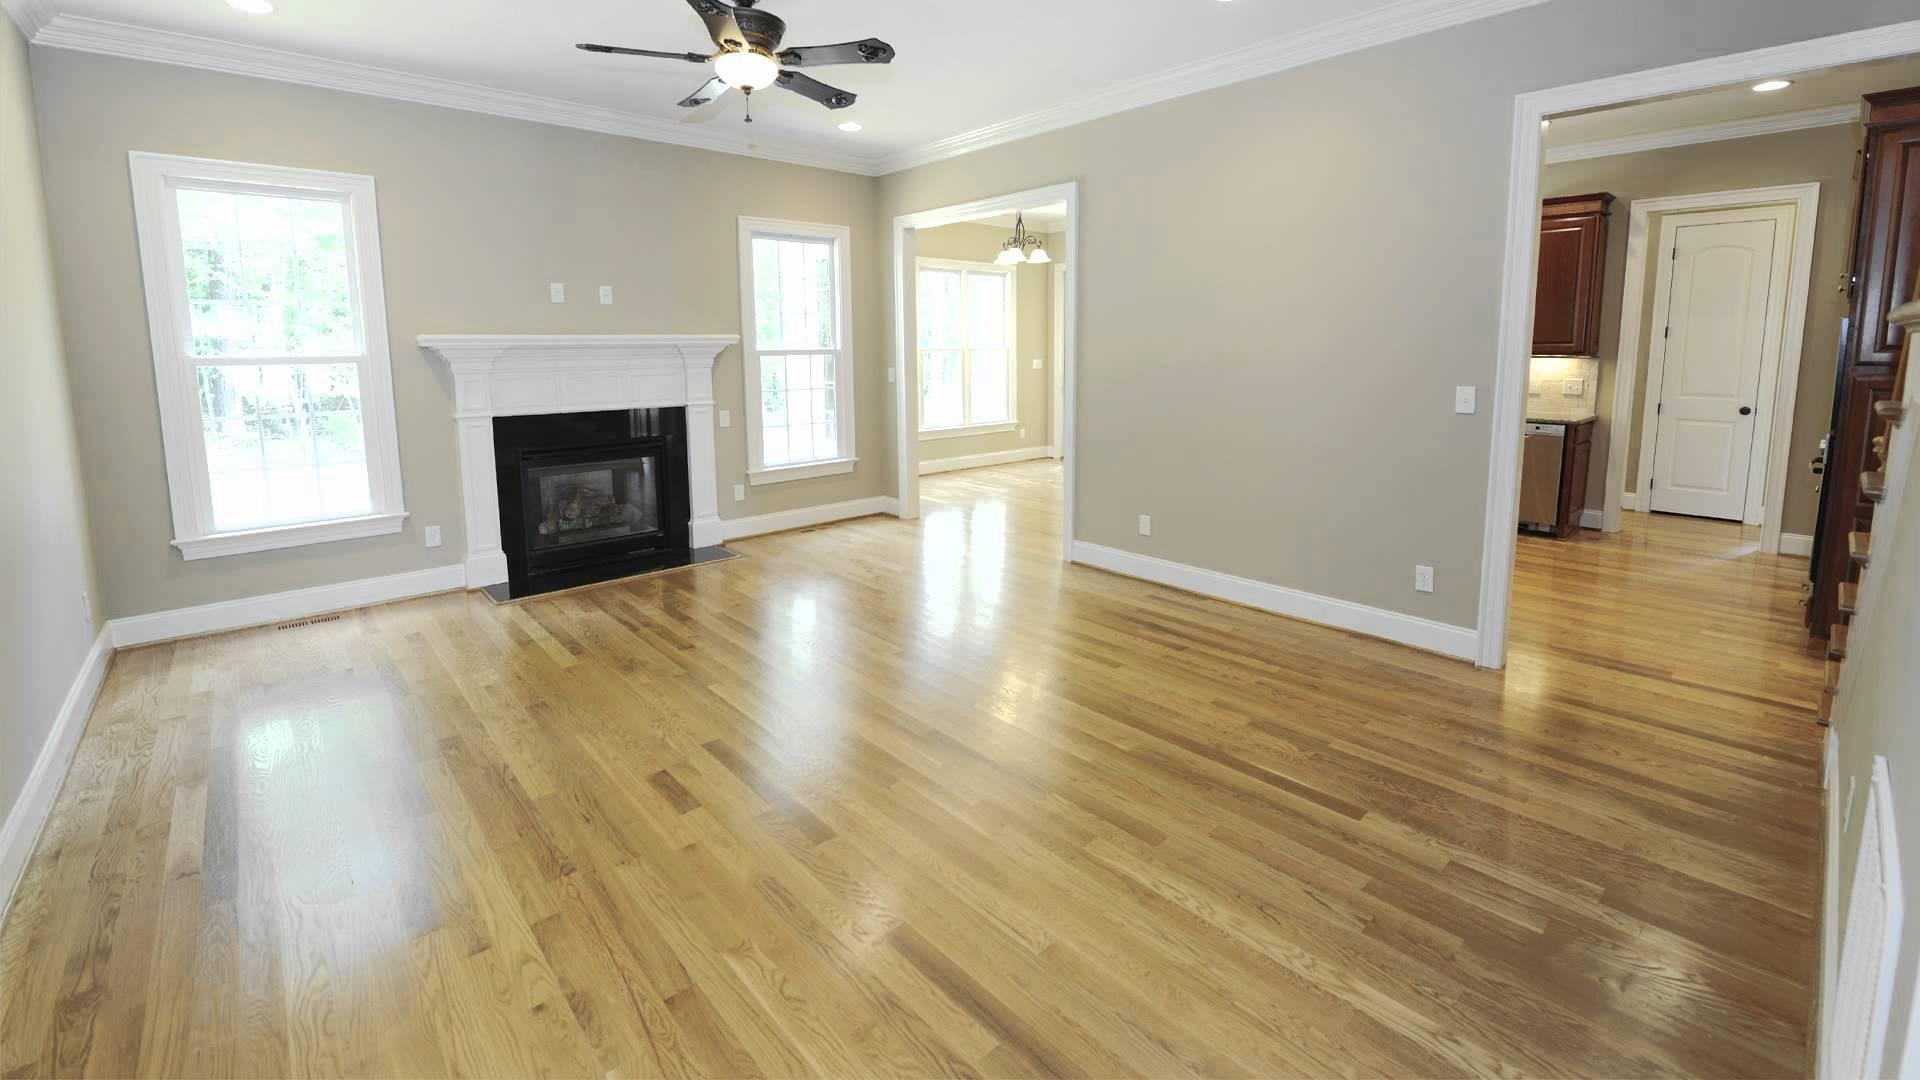 red oak hardwood flooring | red oak floor | red oak floors - AVWVPAG